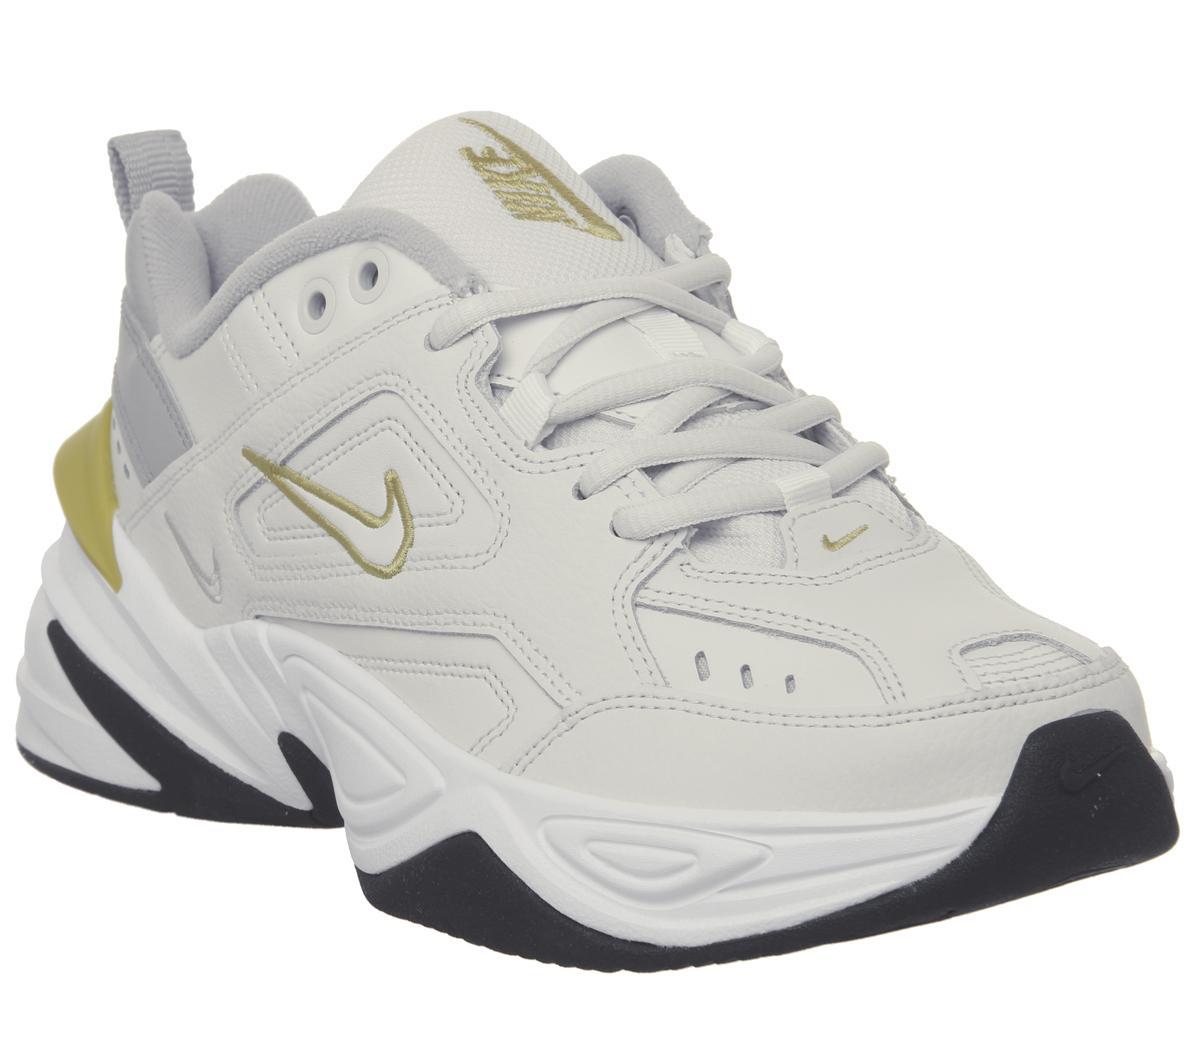 Nike M2k Tekno PLATINUM CELERY WOLF